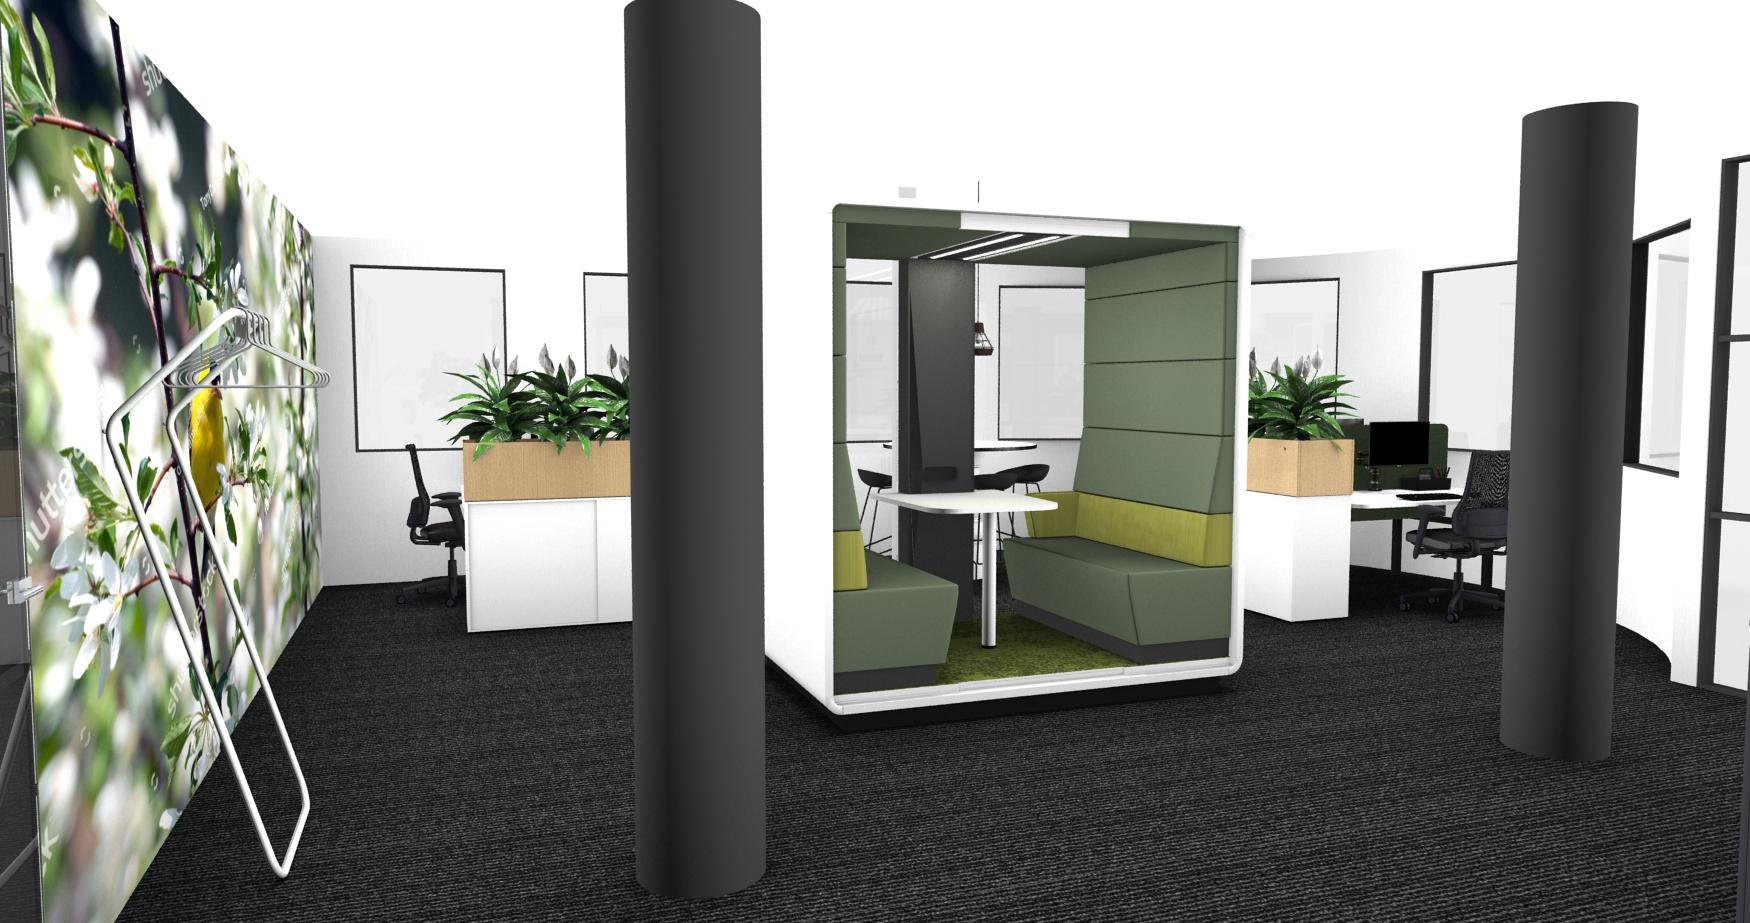 Cube_Vergaderruimte_InsideOffice